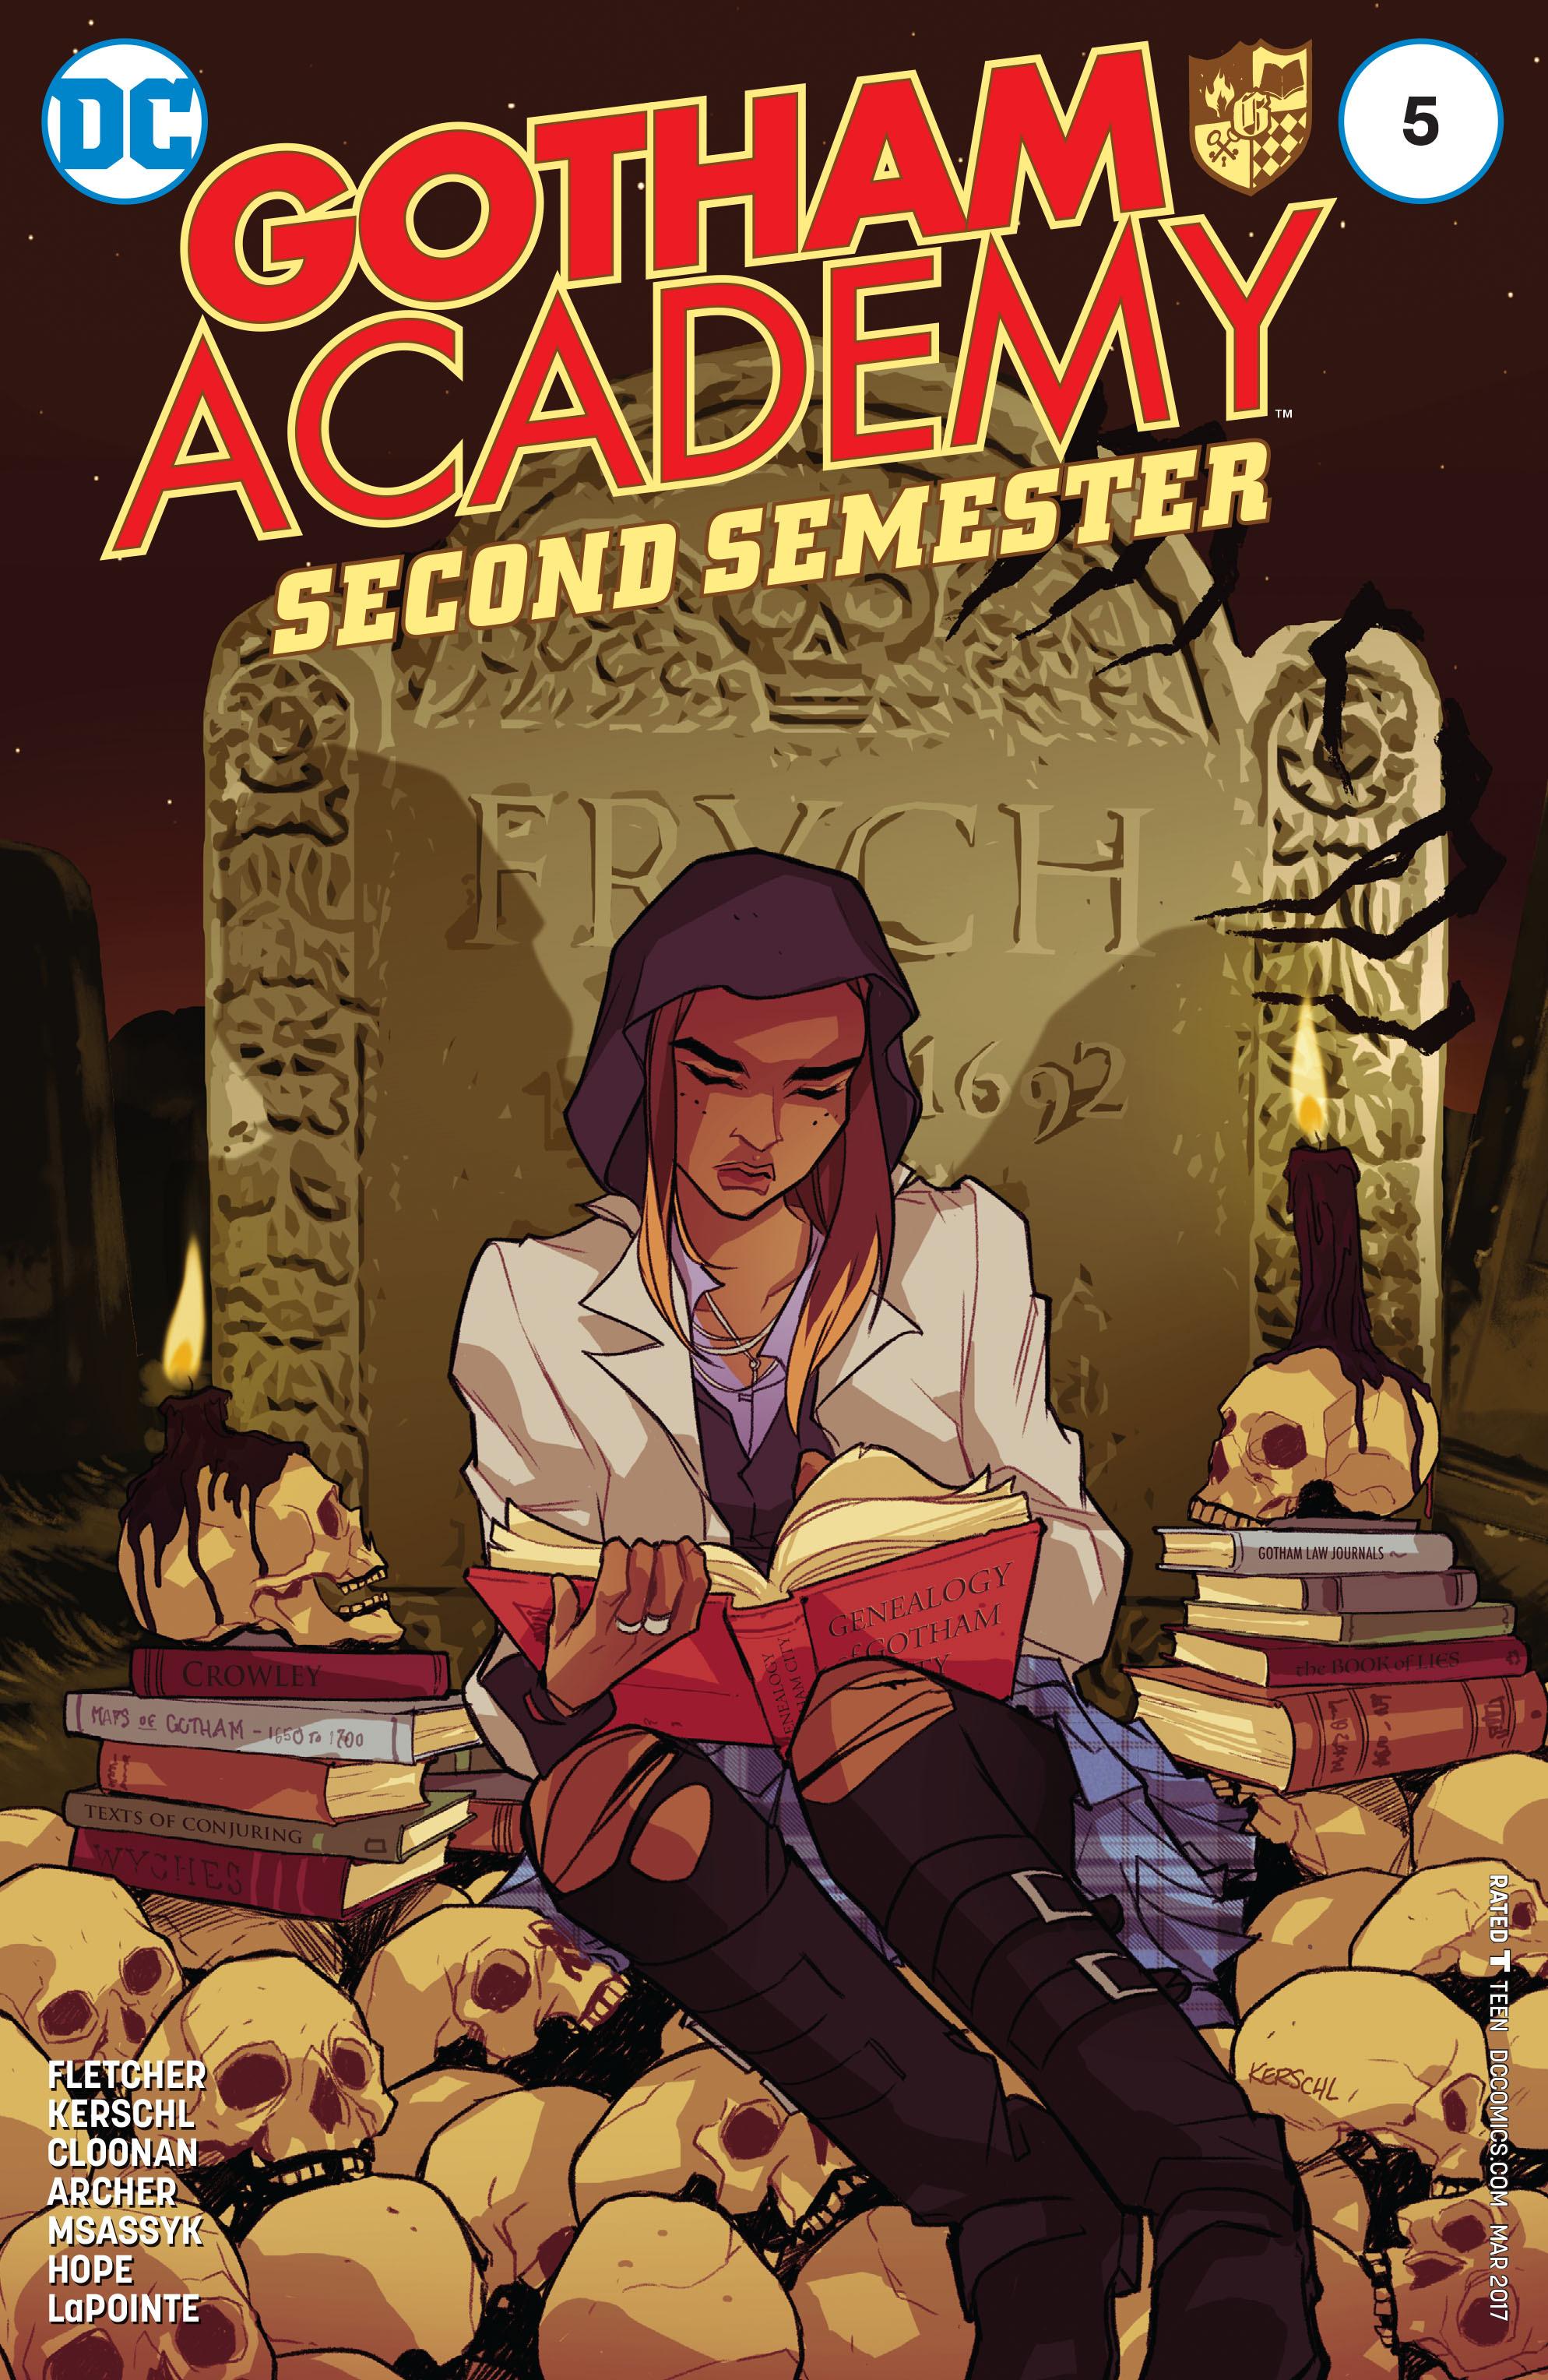 Gotham Academy SS 5